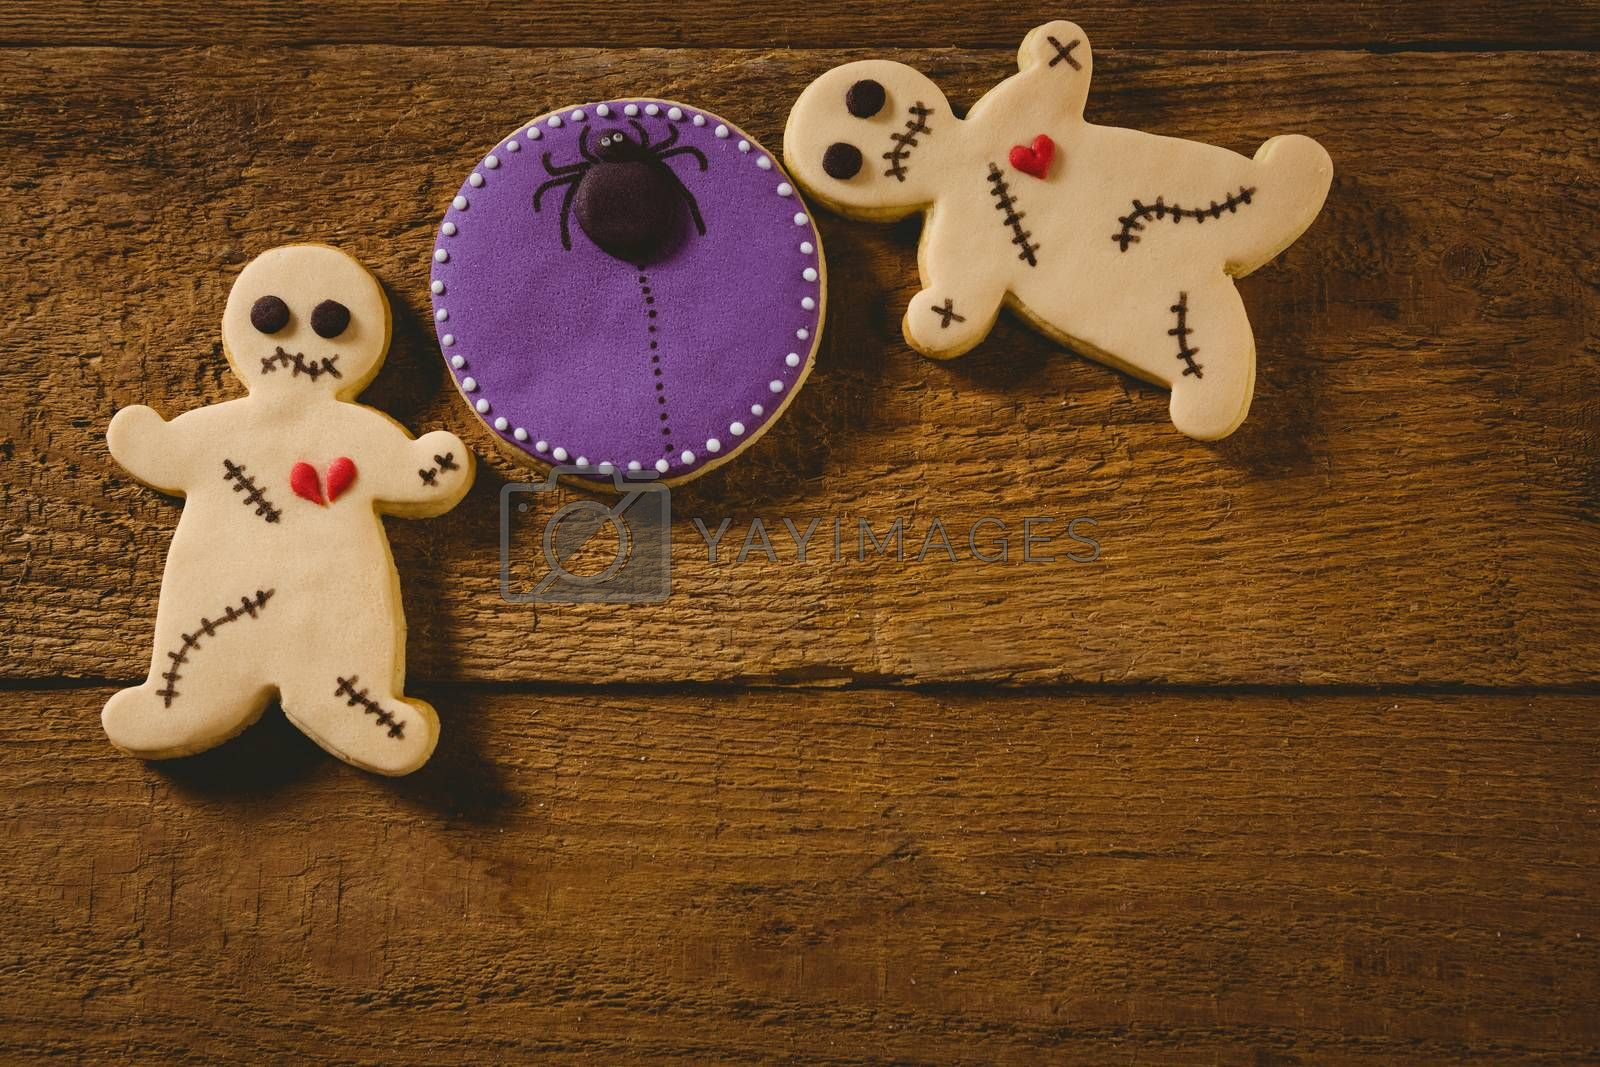 Overhead view of Halloween cookies on wooden table